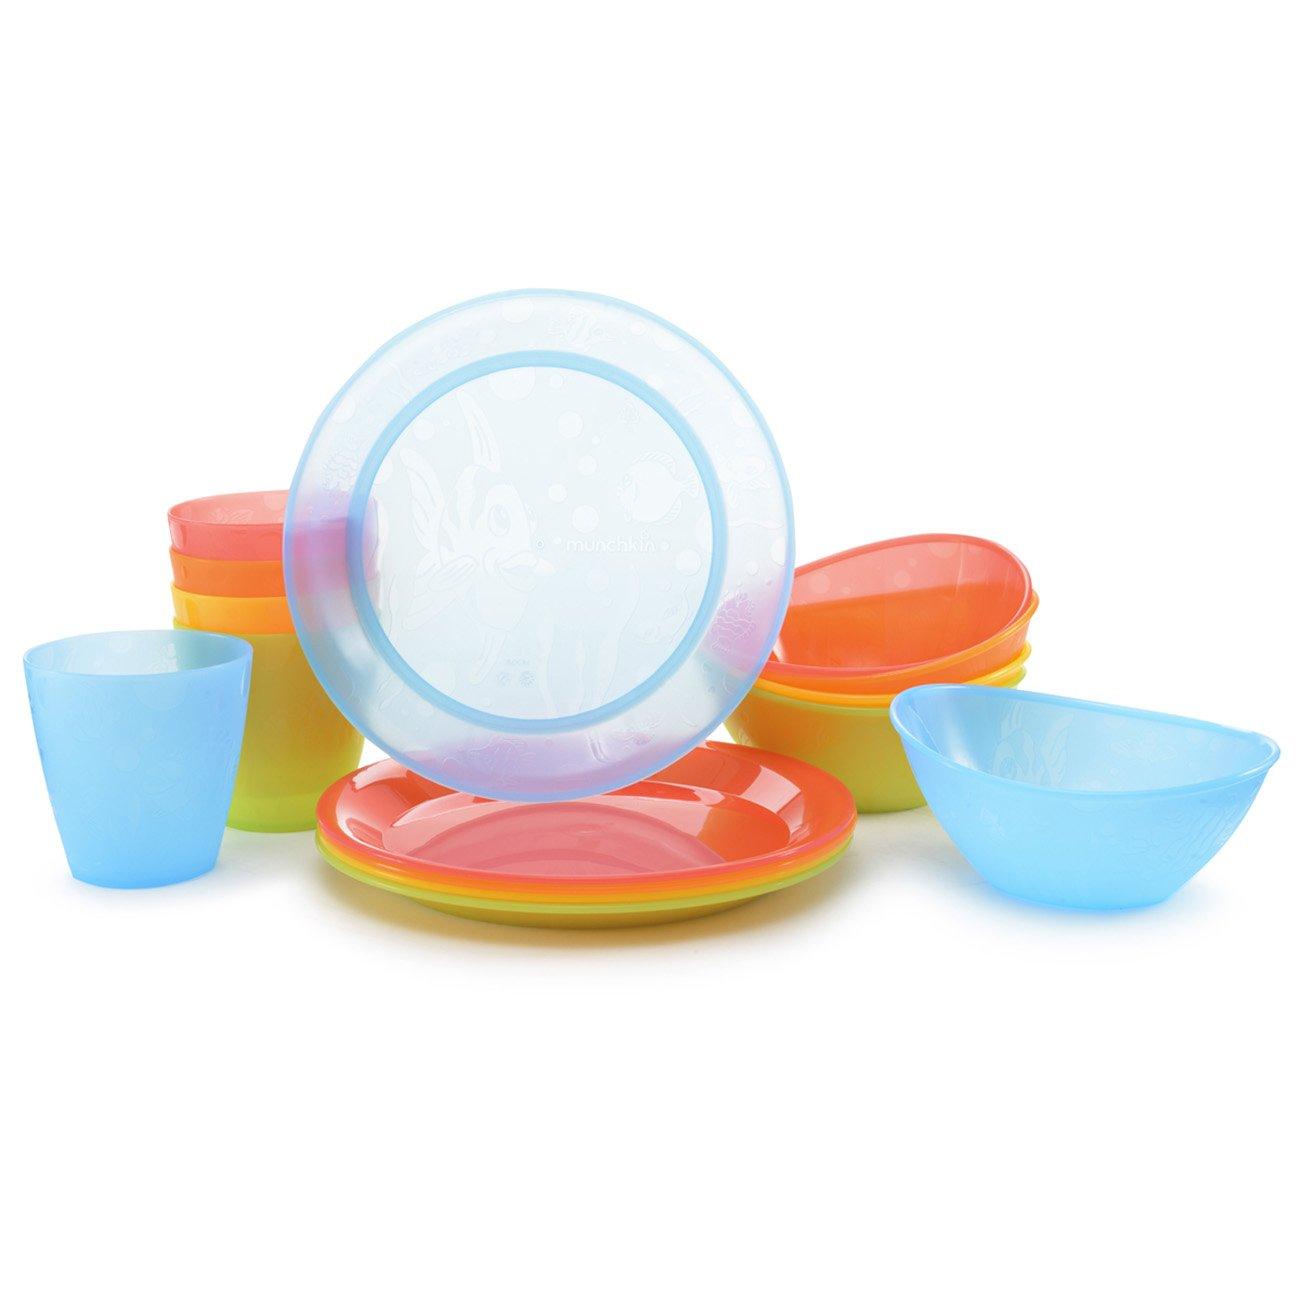 sc 1 st  Amazon.com & Amazon.com : Munchkin Feeding Set 15 Pack : Baby